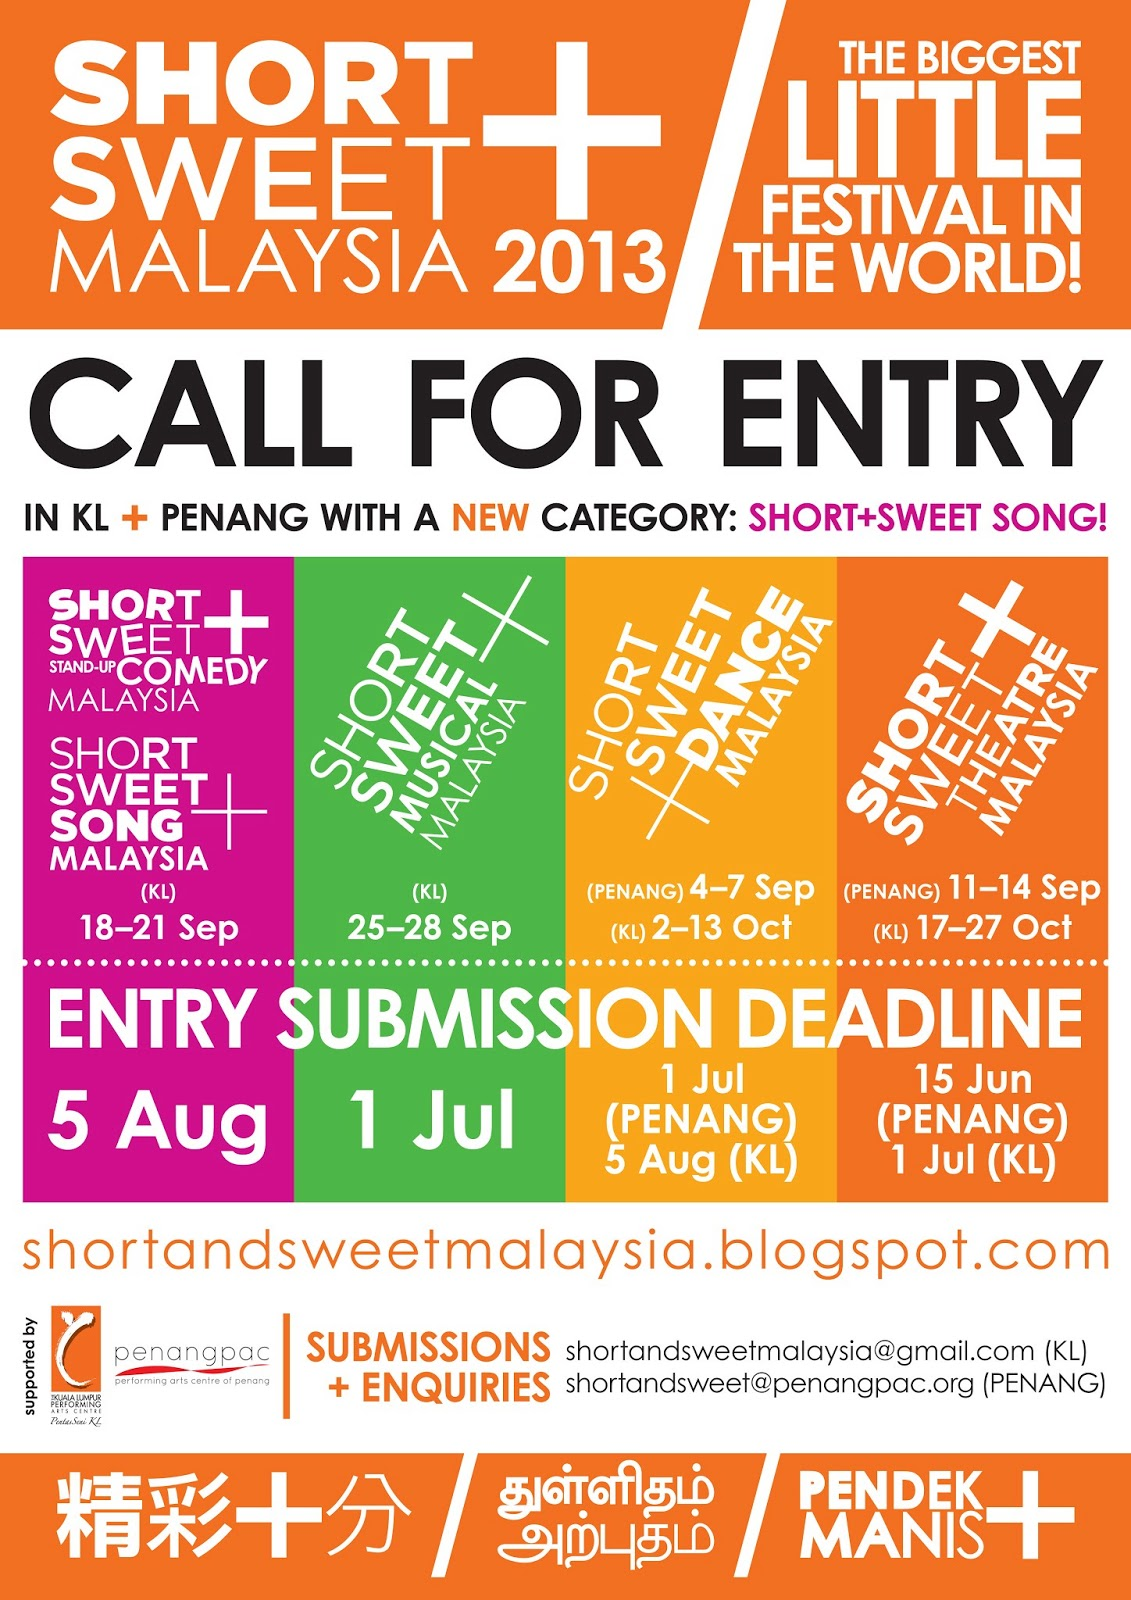 spm essay about festival in malaysia